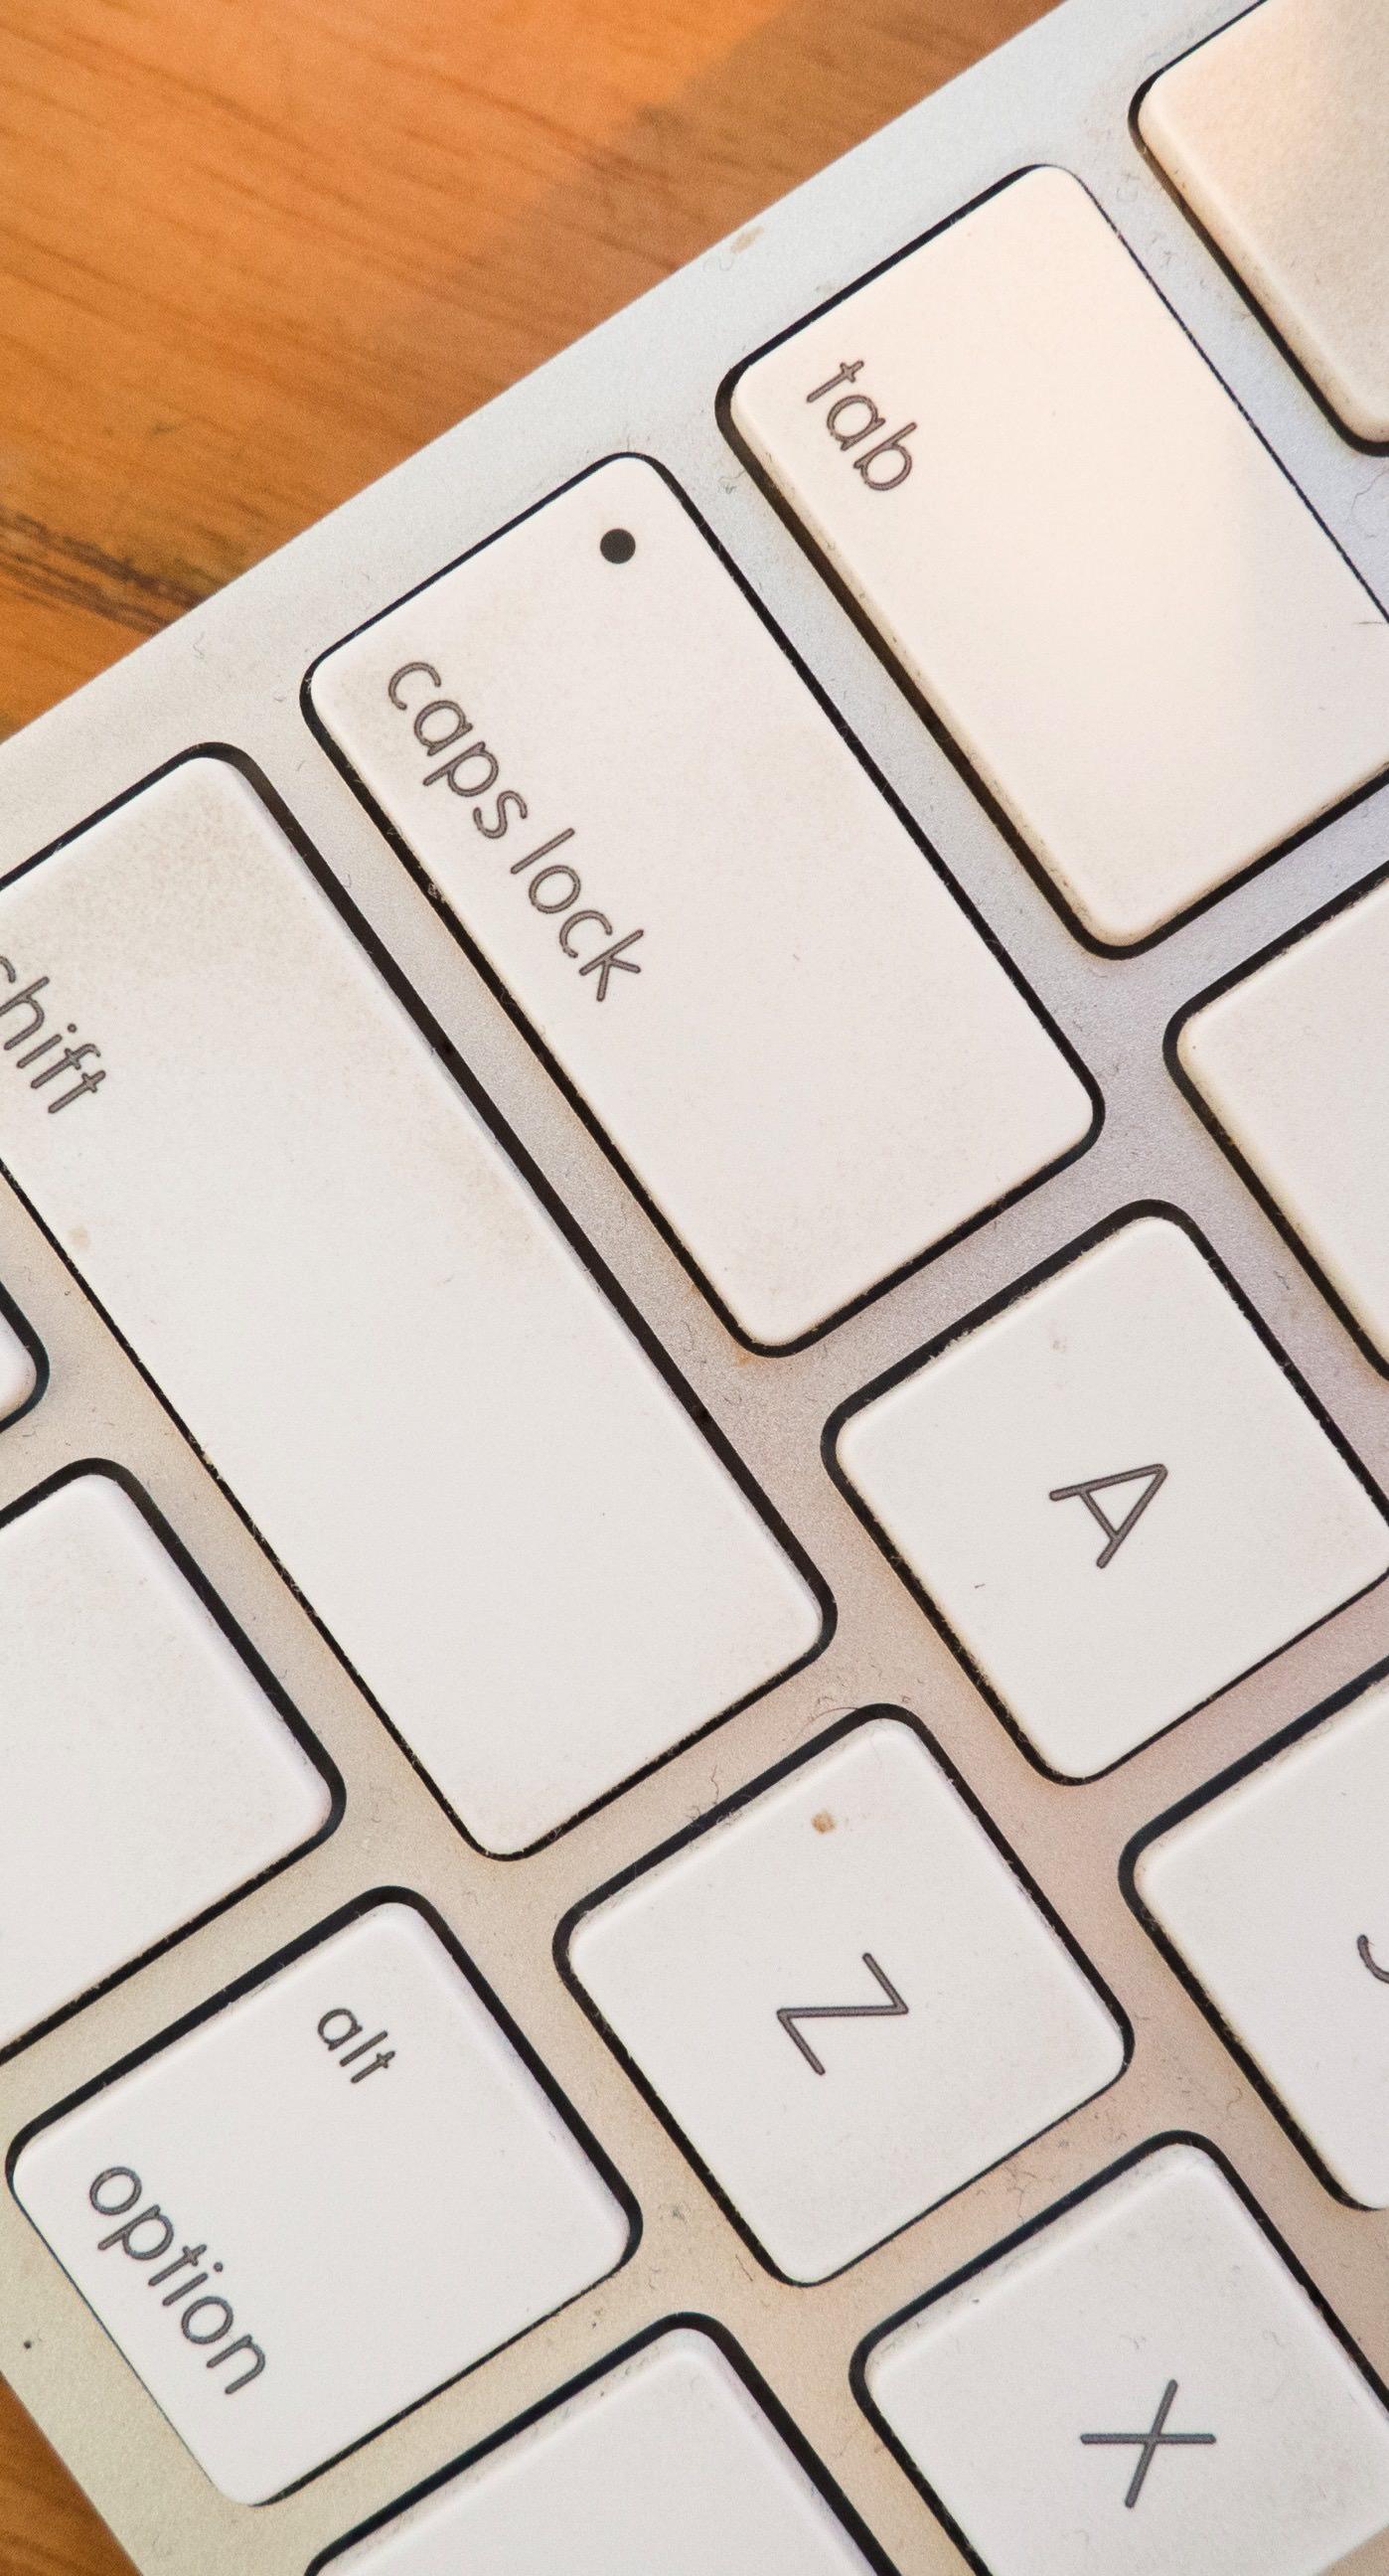 Apple Mac Usキーボード Wallpaper Sc Iphone6splus壁紙